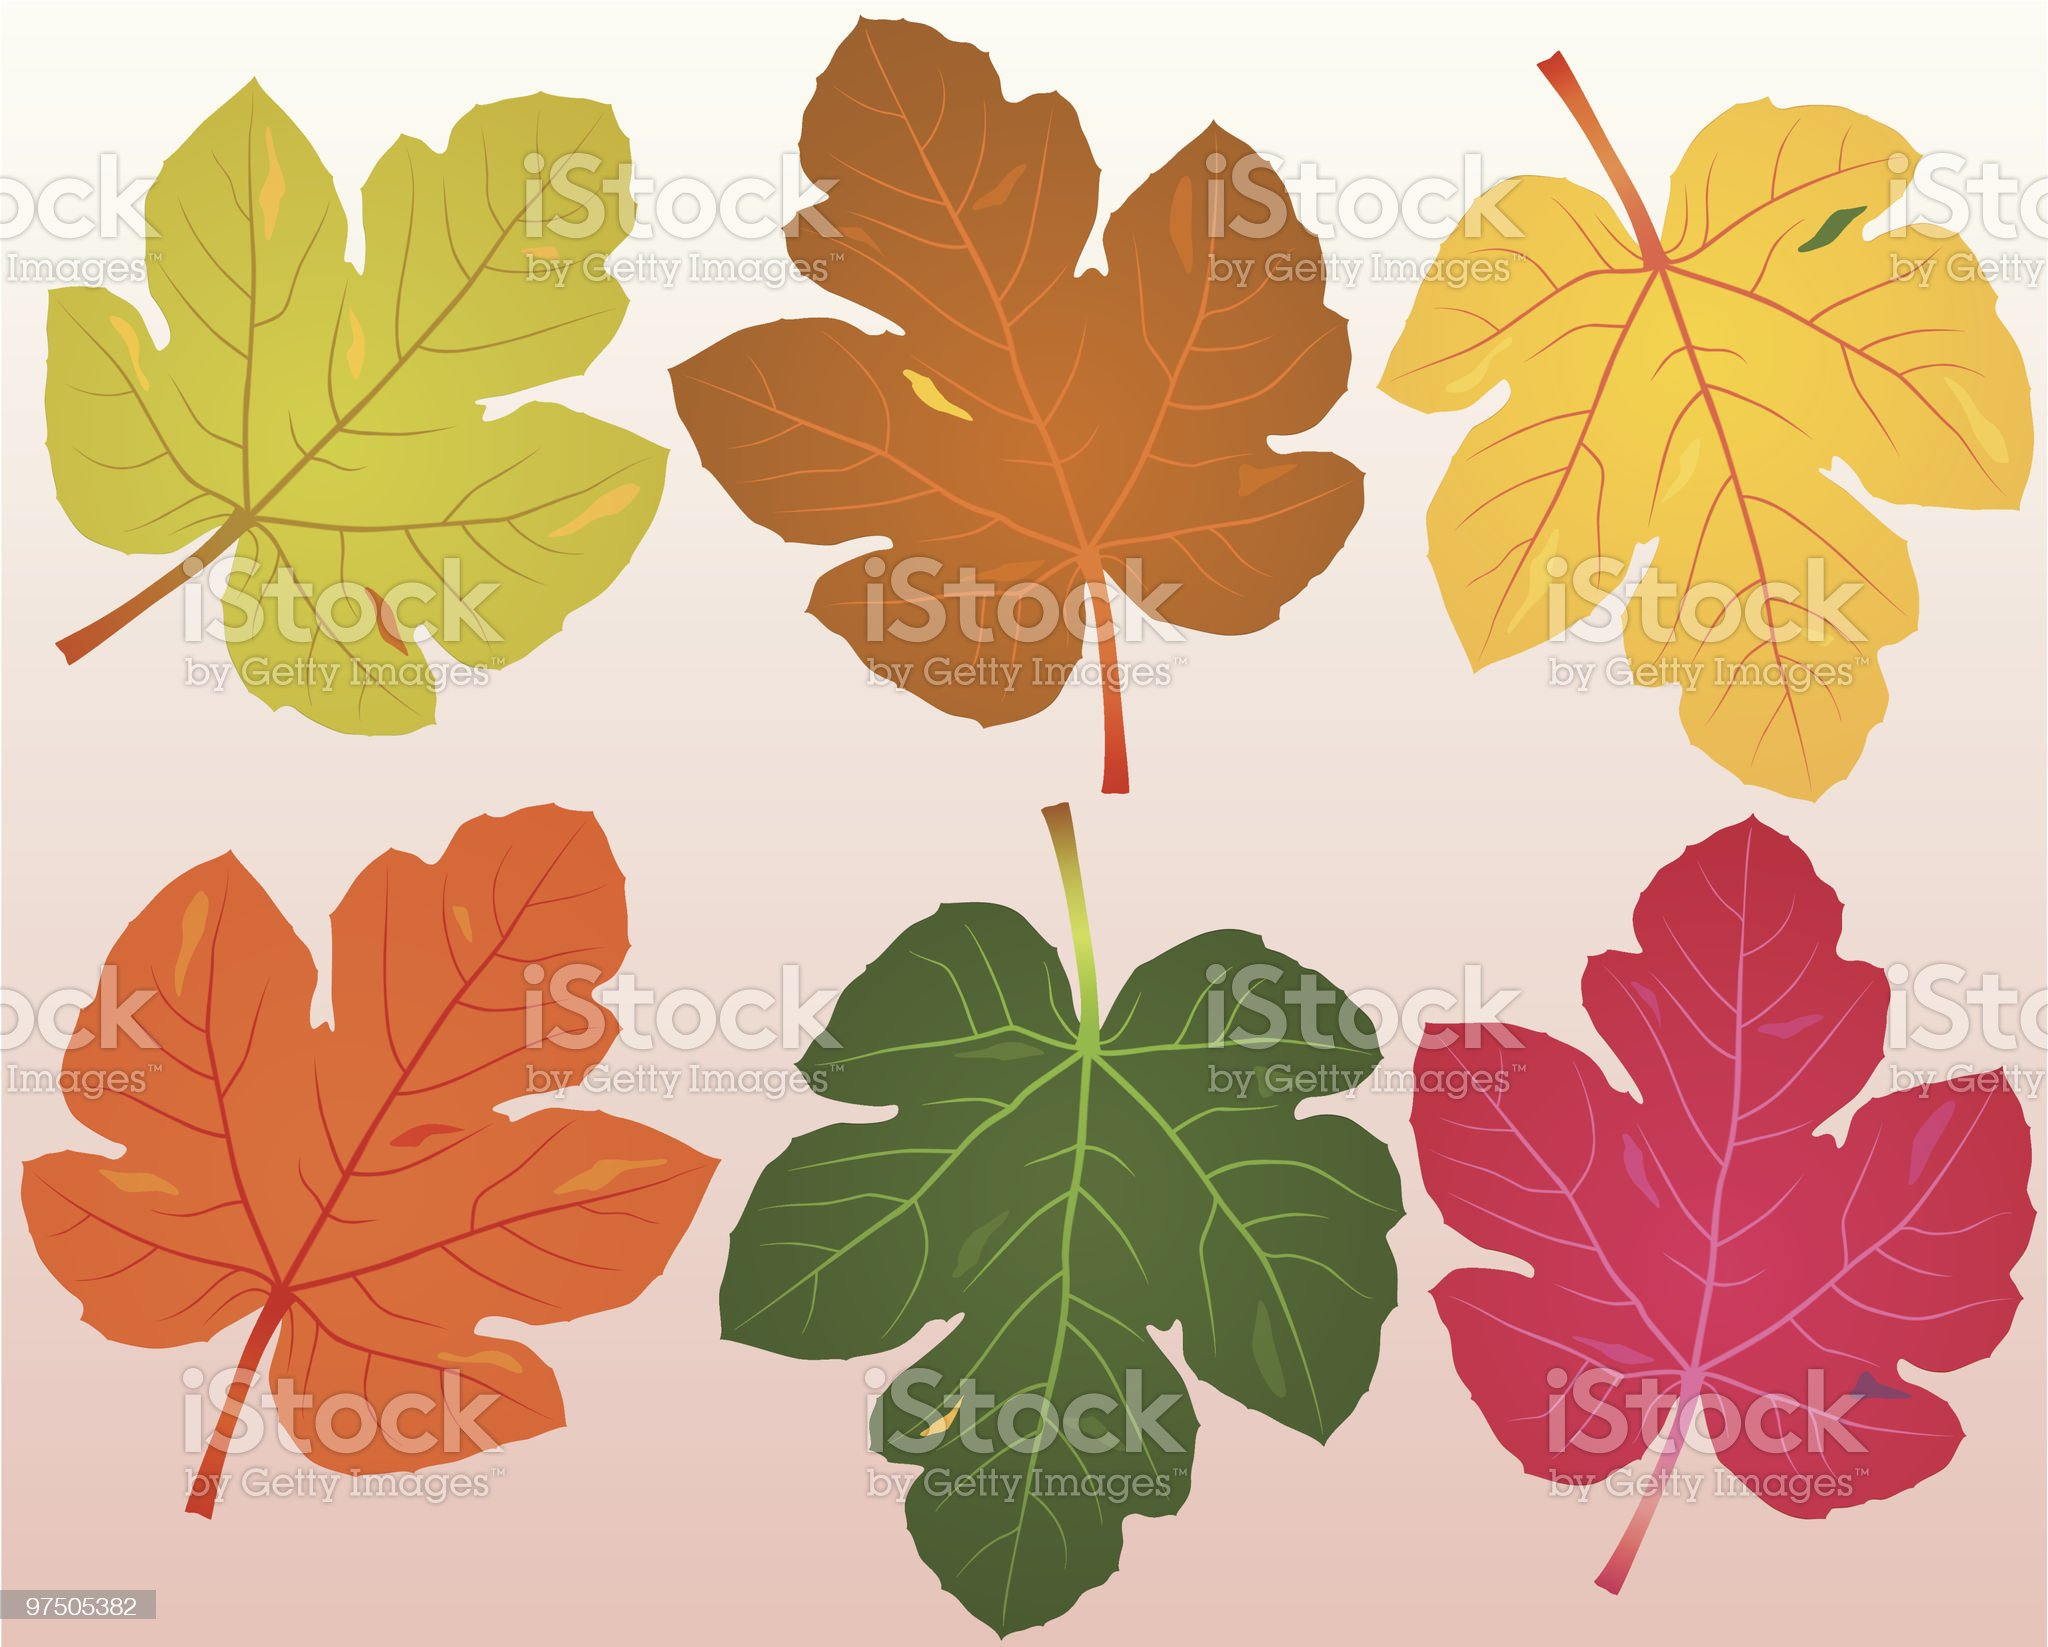 Fallen Fig Leaves royalty-free stock vector art